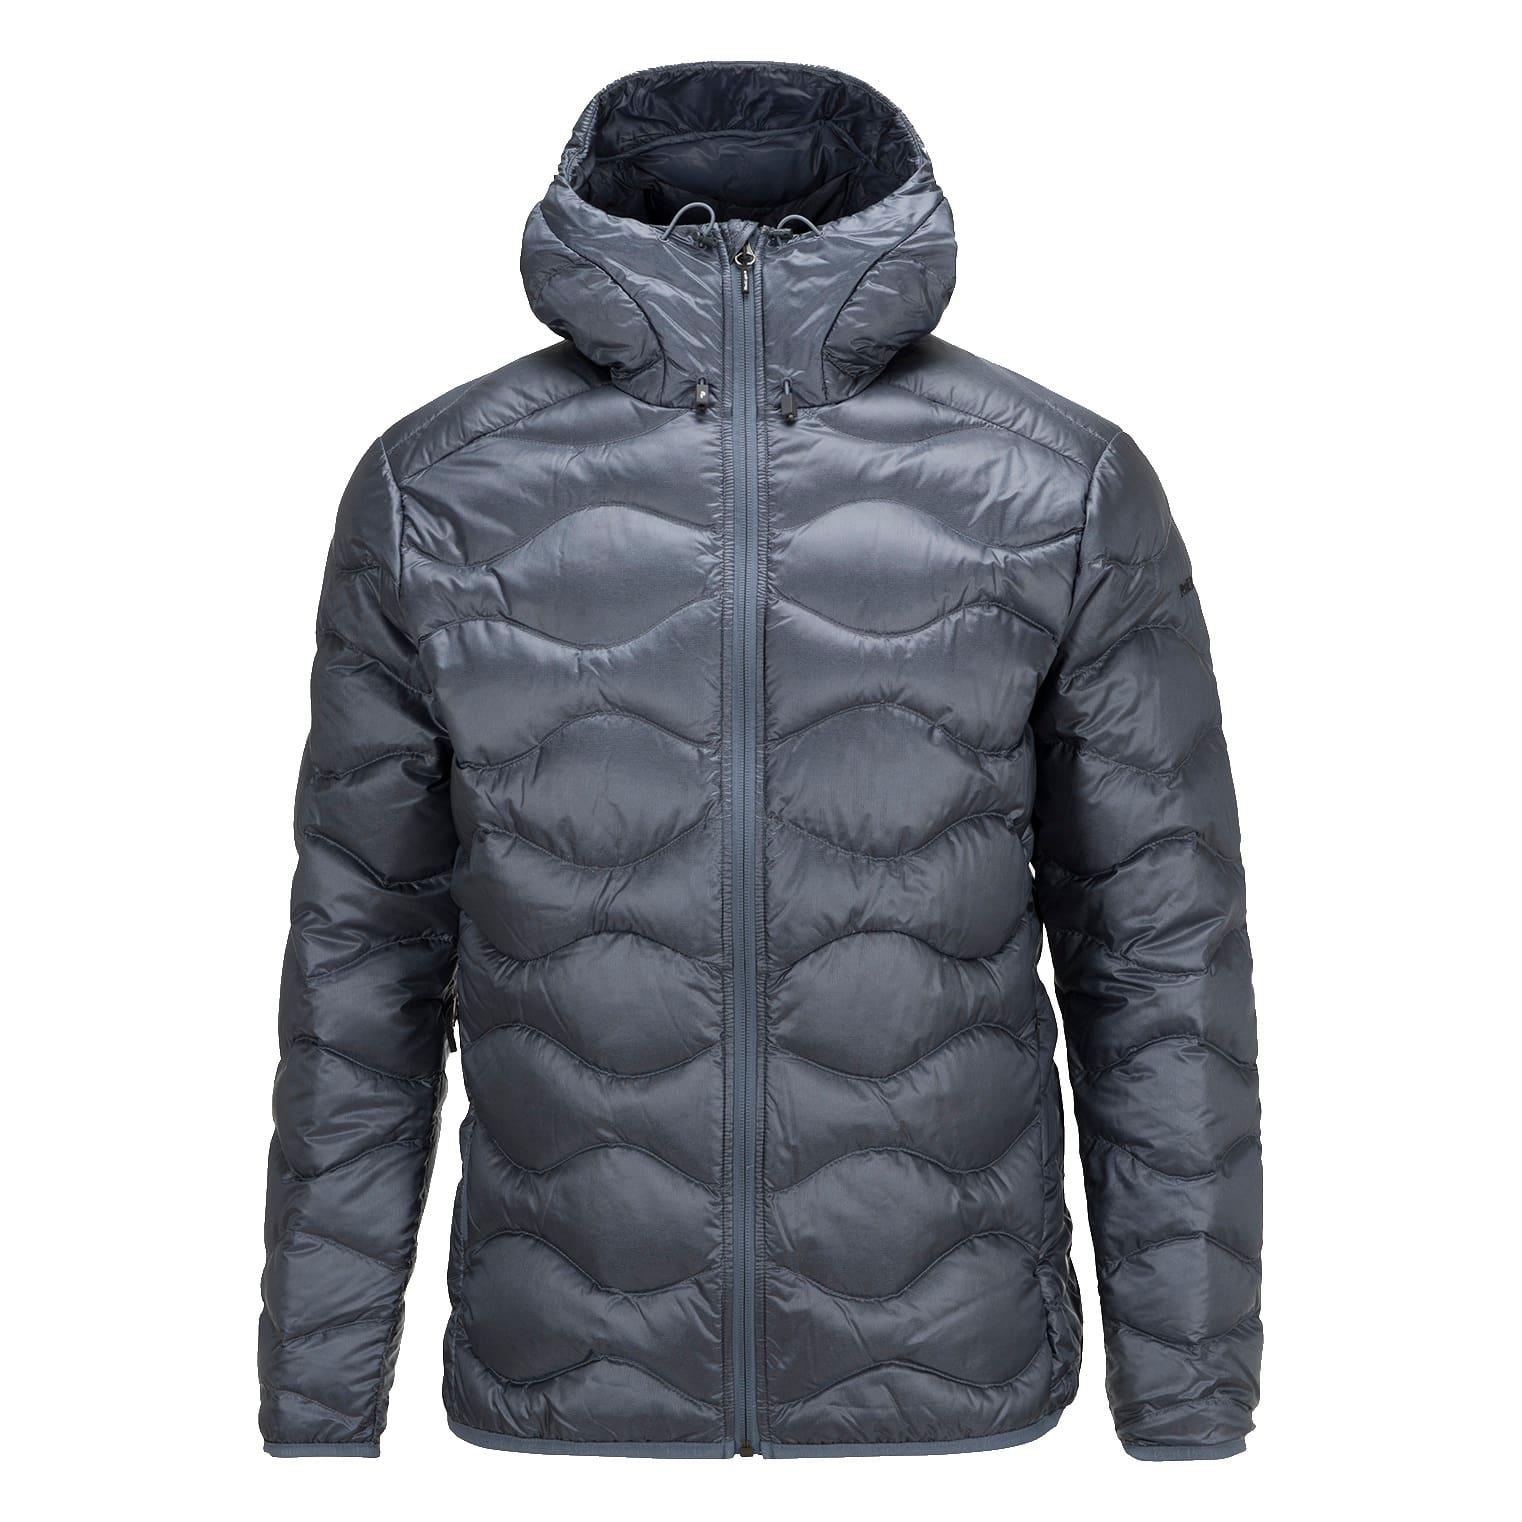 Buy Peak Performance Men s Black Light Helium Hooded Jacket from Outnorth 8129391416